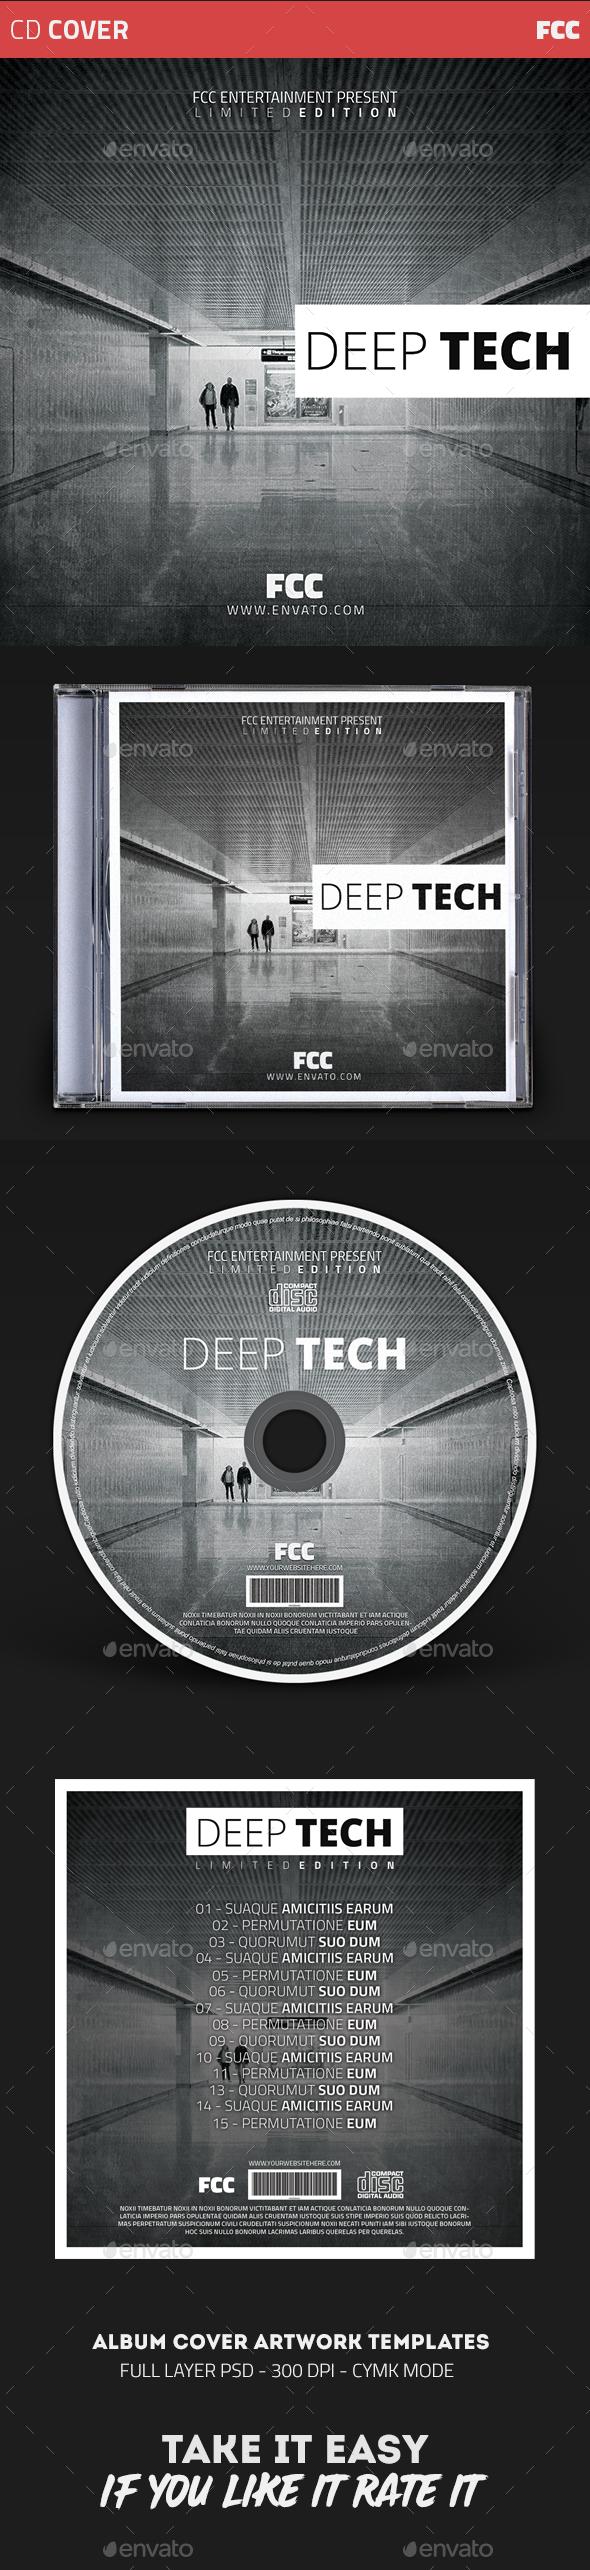 Deep Tech Album Cover Templates - CD & DVD Artwork Print Templates